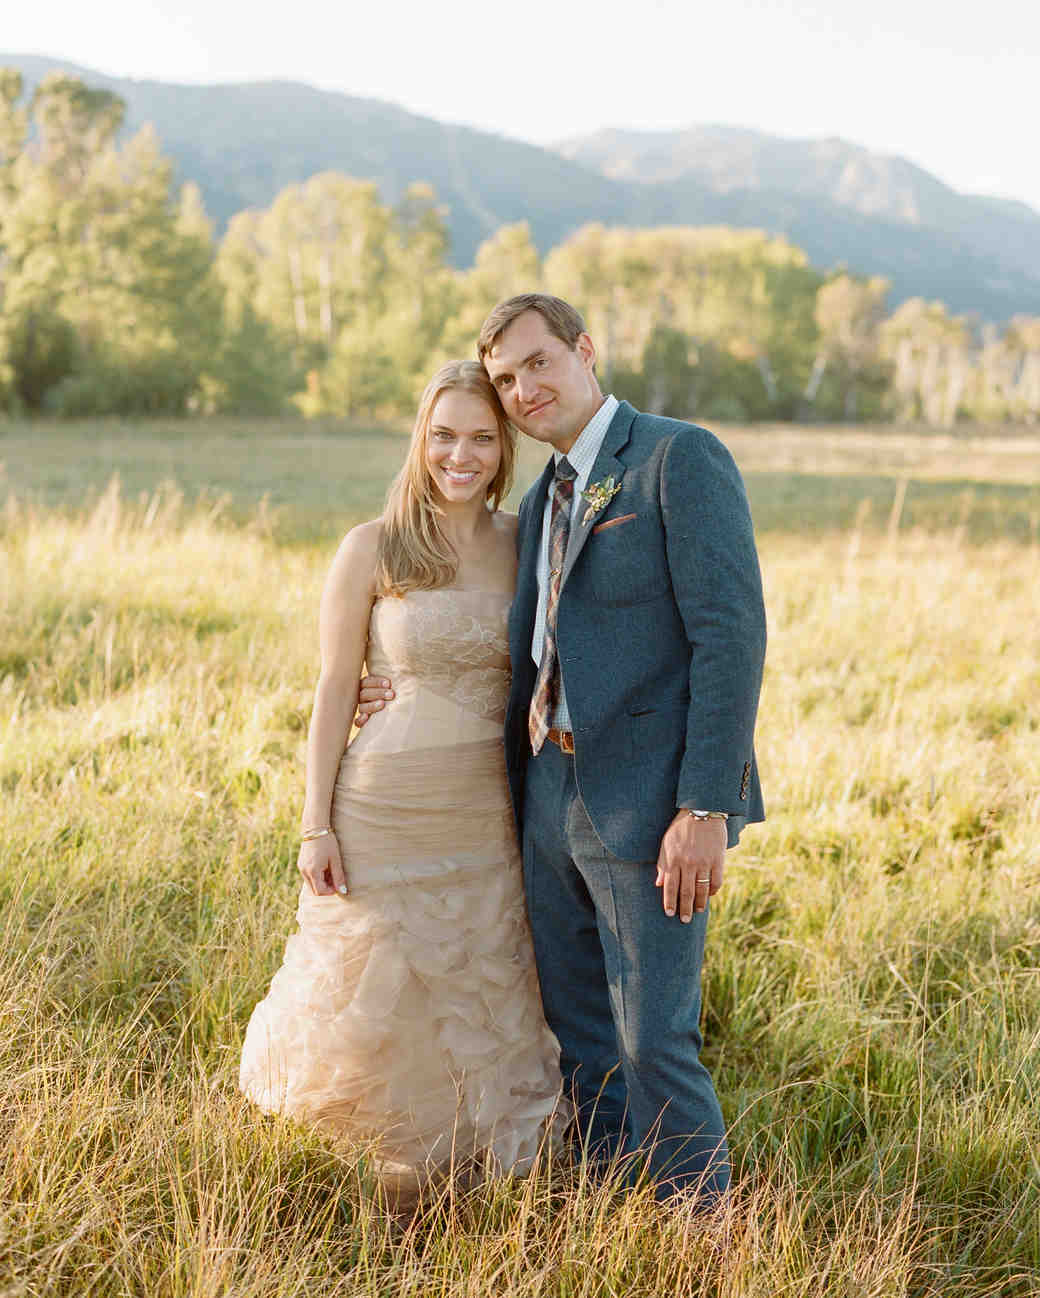 callie-eric-wedding-couple-594-s112113-0815.jpg